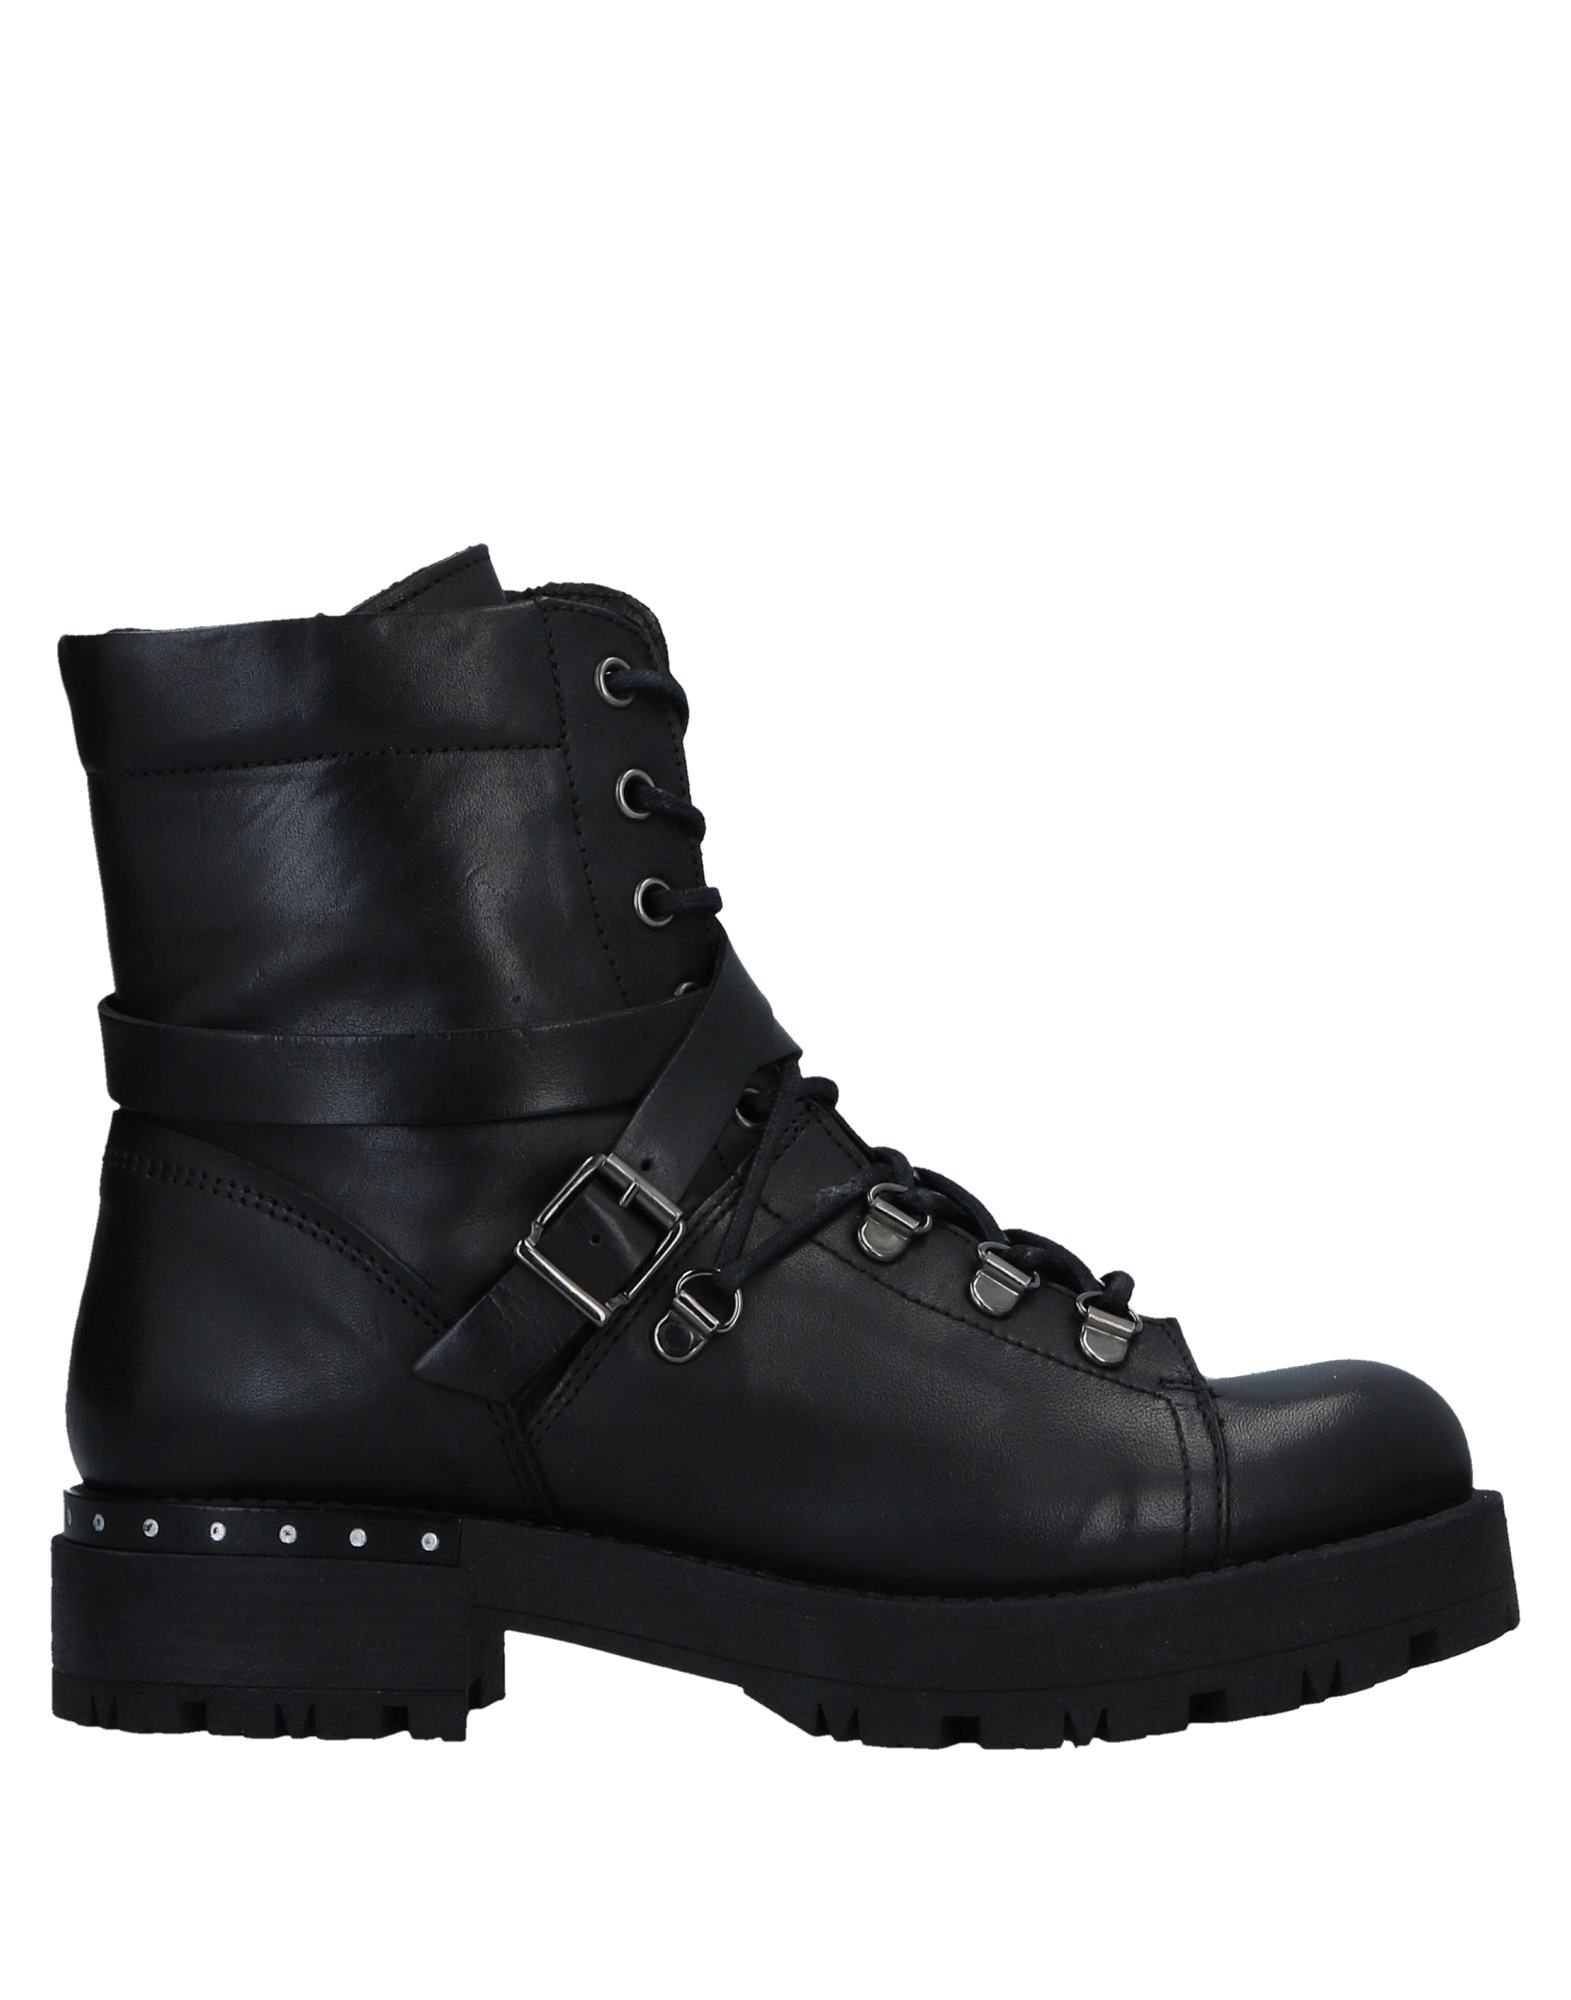 Cafènoir Stiefelette Damen  11514983KI Gute Qualität beliebte Schuhe